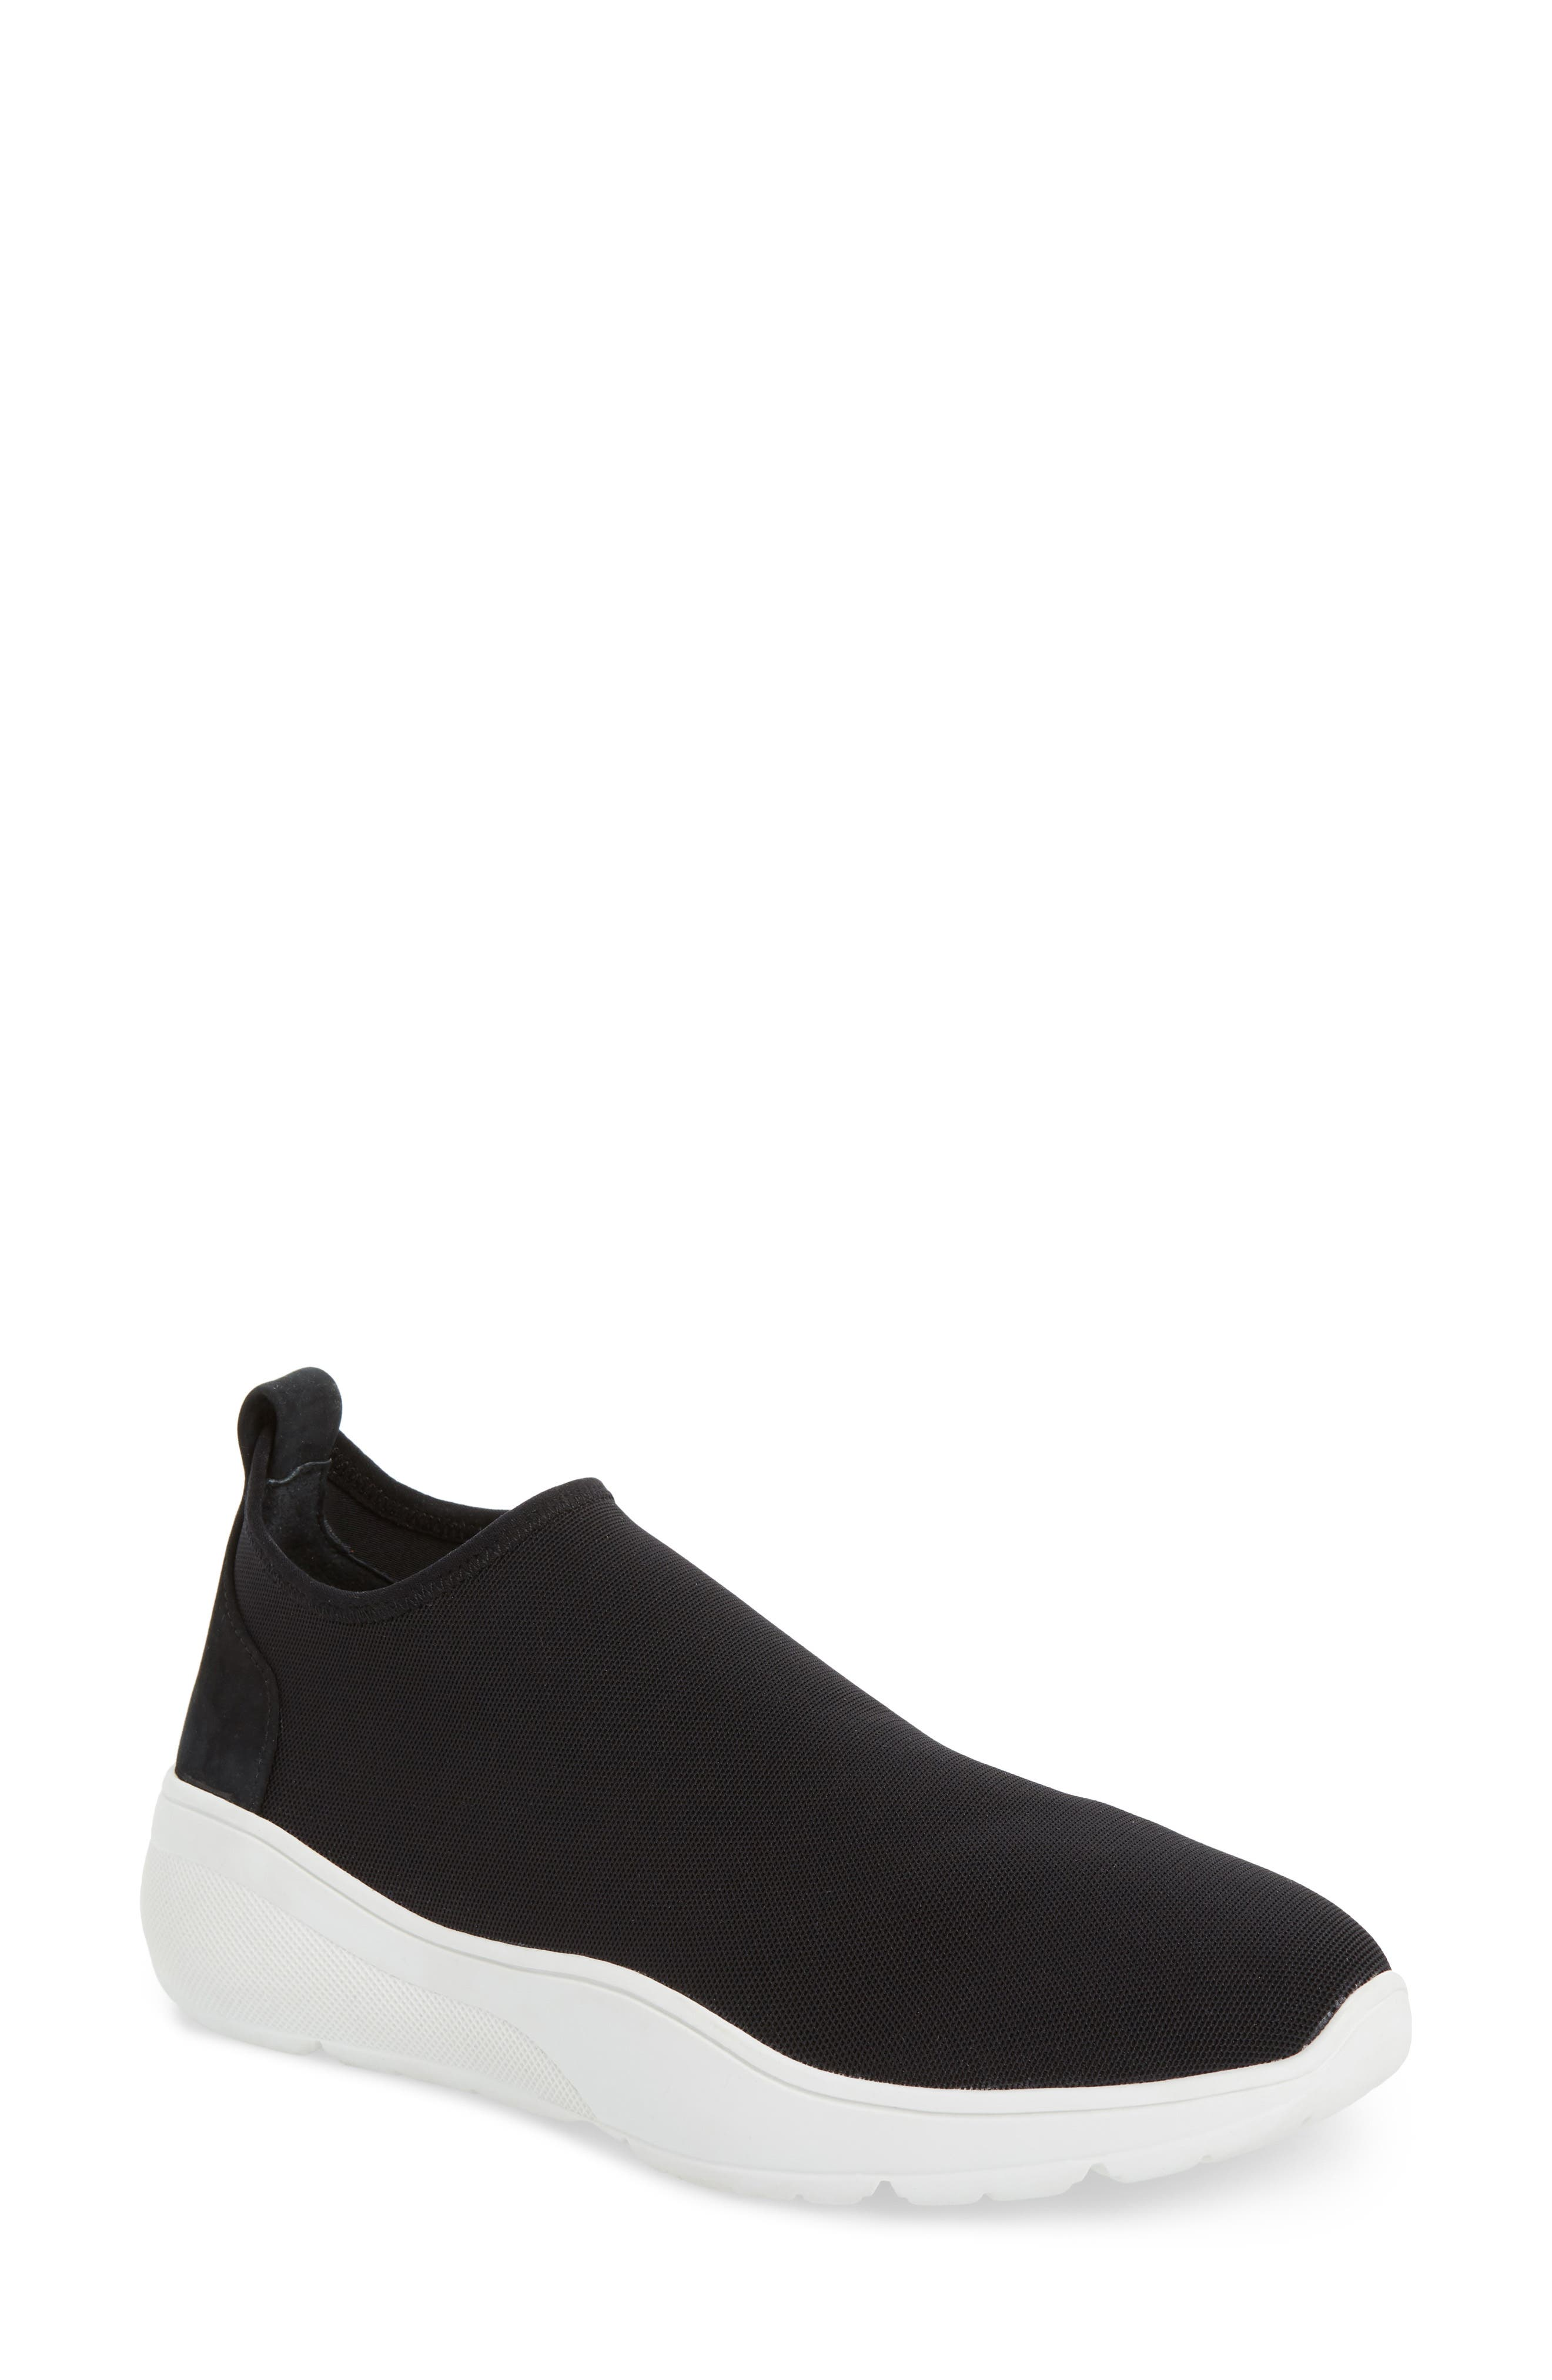 KATE SPADE NEW YORK bradlee slip-on sneaker, Main, color, 001